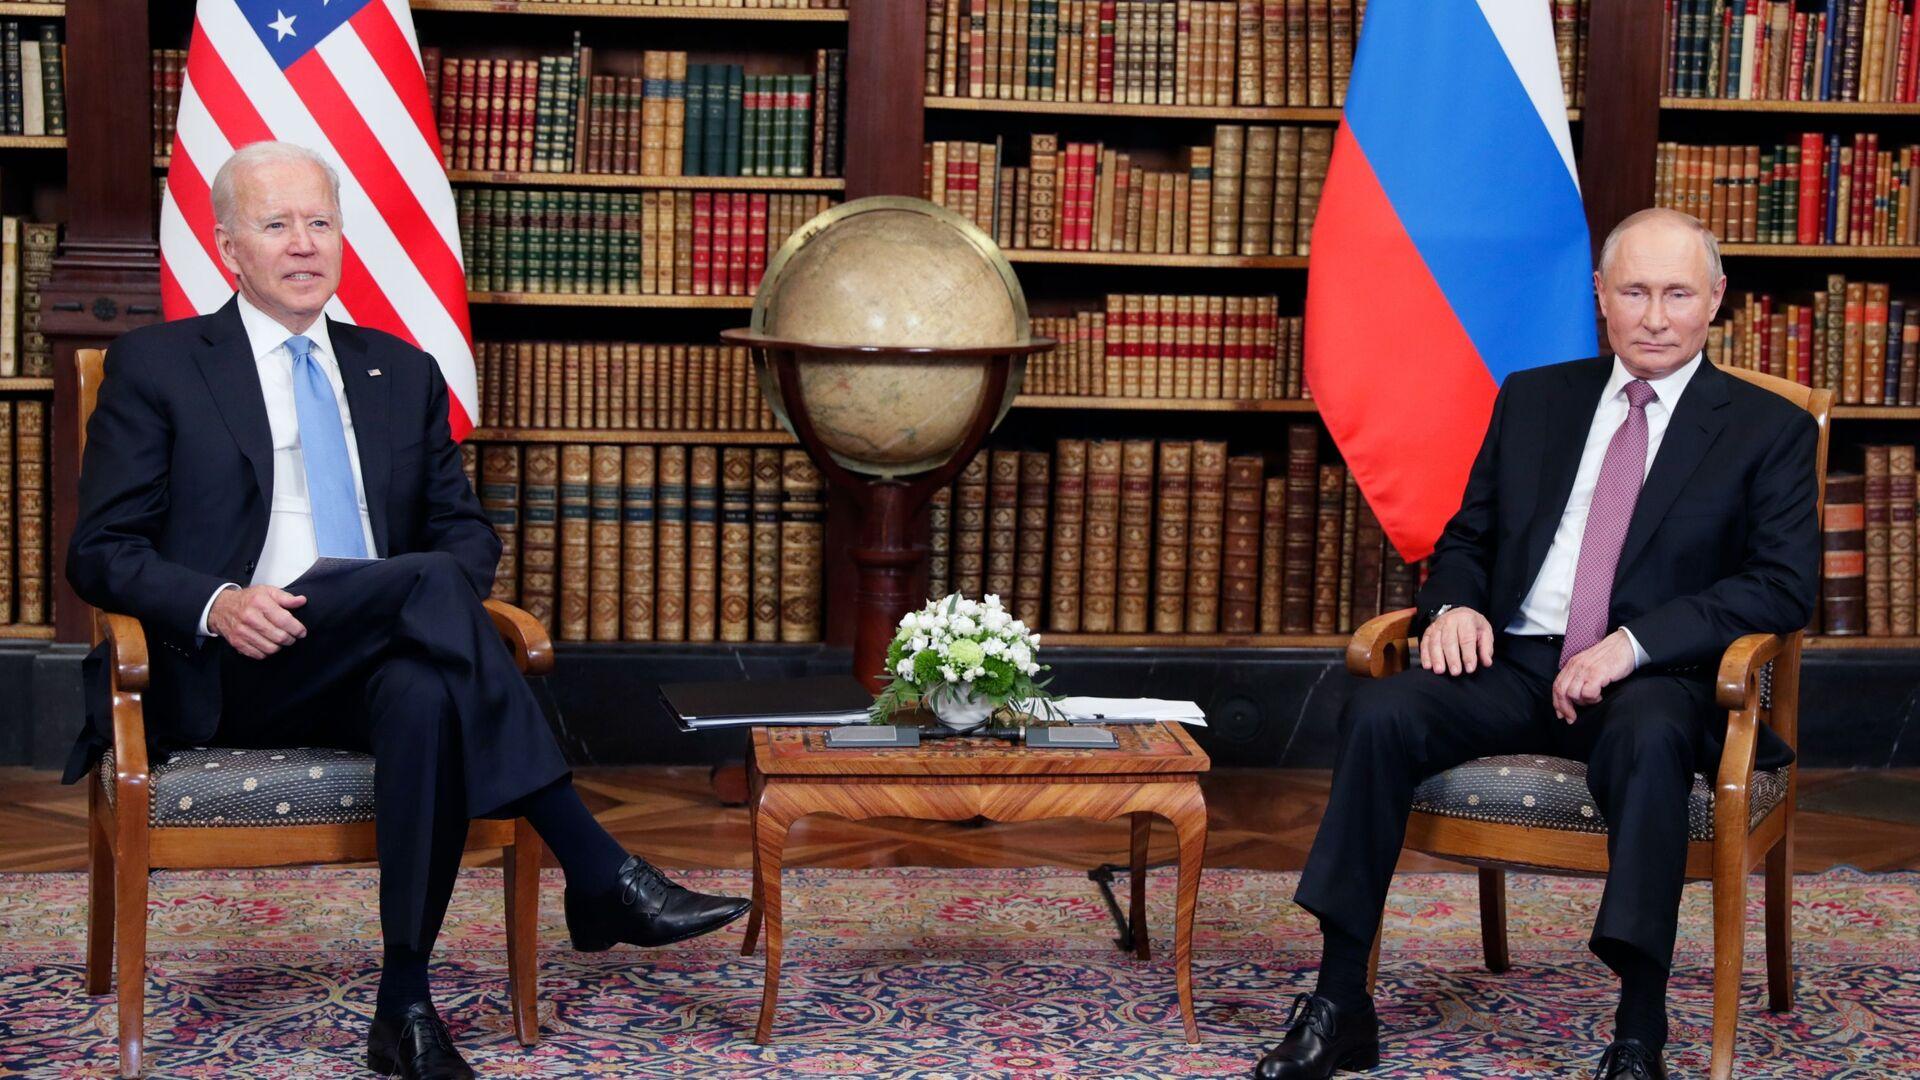 Президент РФ Владимир Путин и президент США Джо Байден во время встречи в Женеве на вилле Ла Гранж - Sputnik Italia, 1920, 17.06.2021